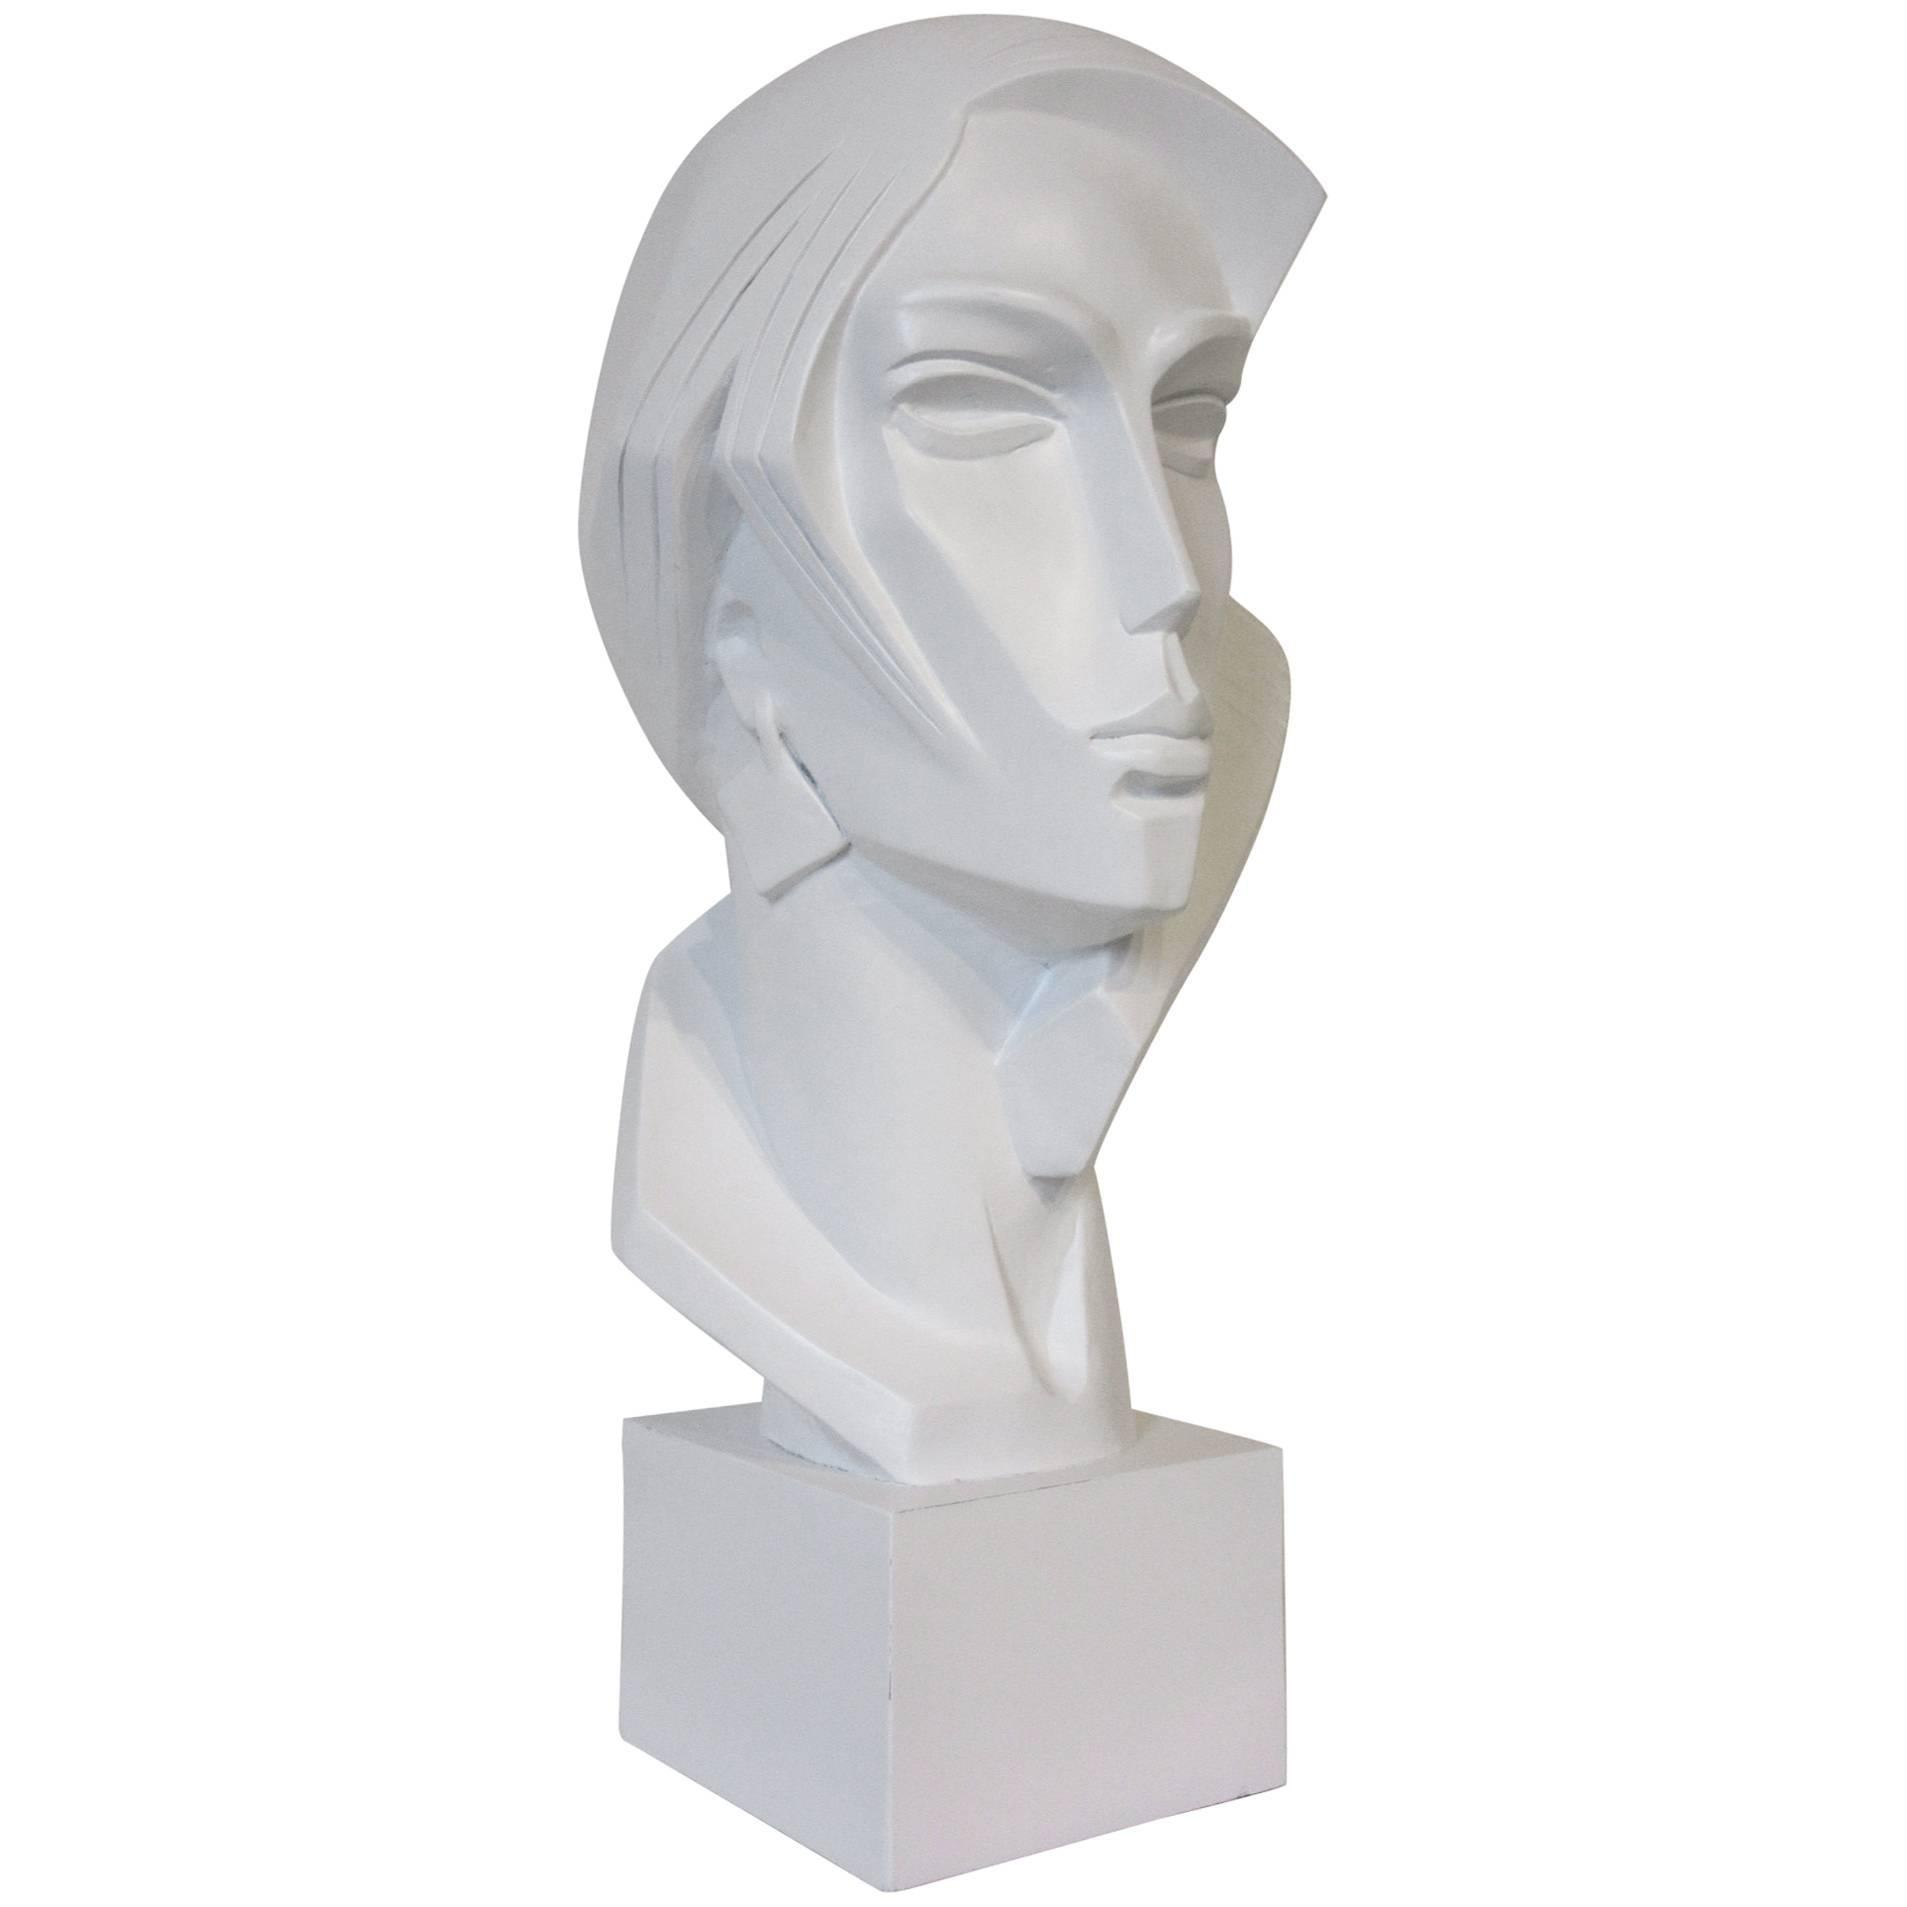 1980s Large Female Head Sculpture by Austin